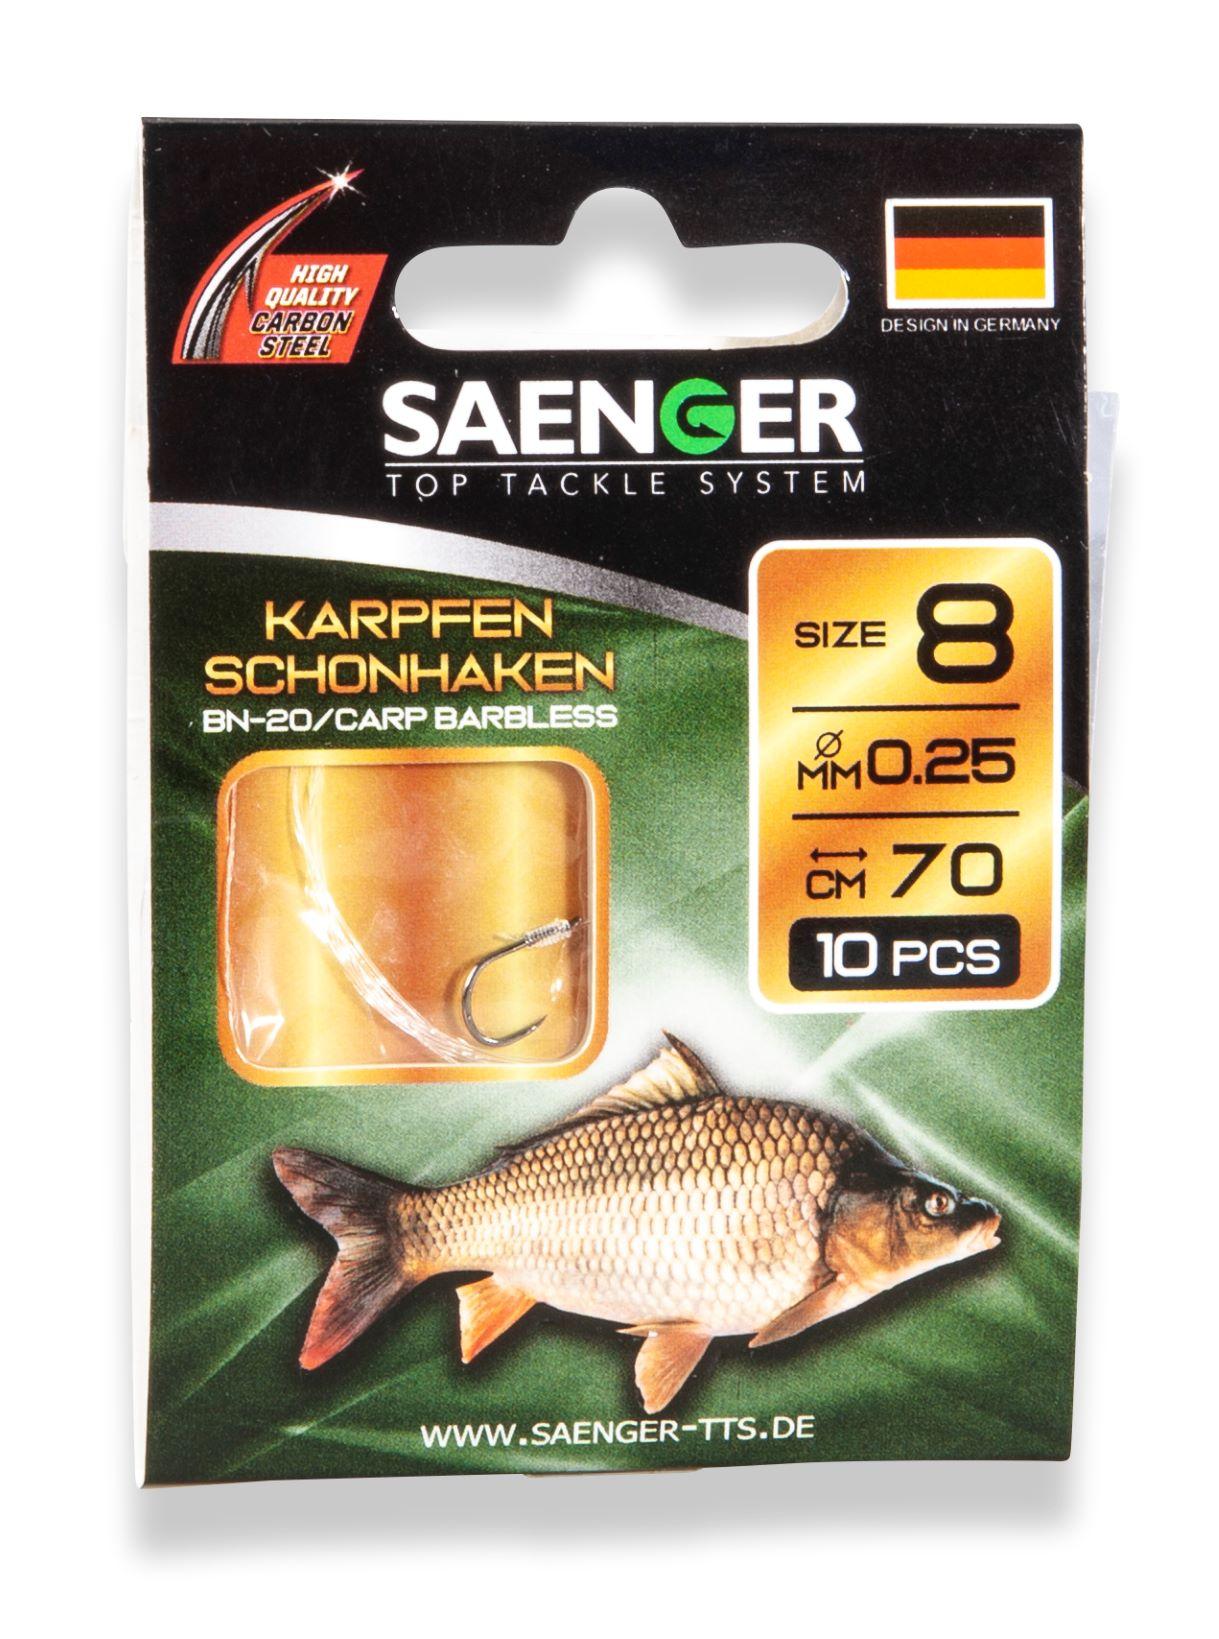 Saenger Návazec na kapry bezprotihrotý Karpfen Schonhaken vel. 10, 10 ks/bal